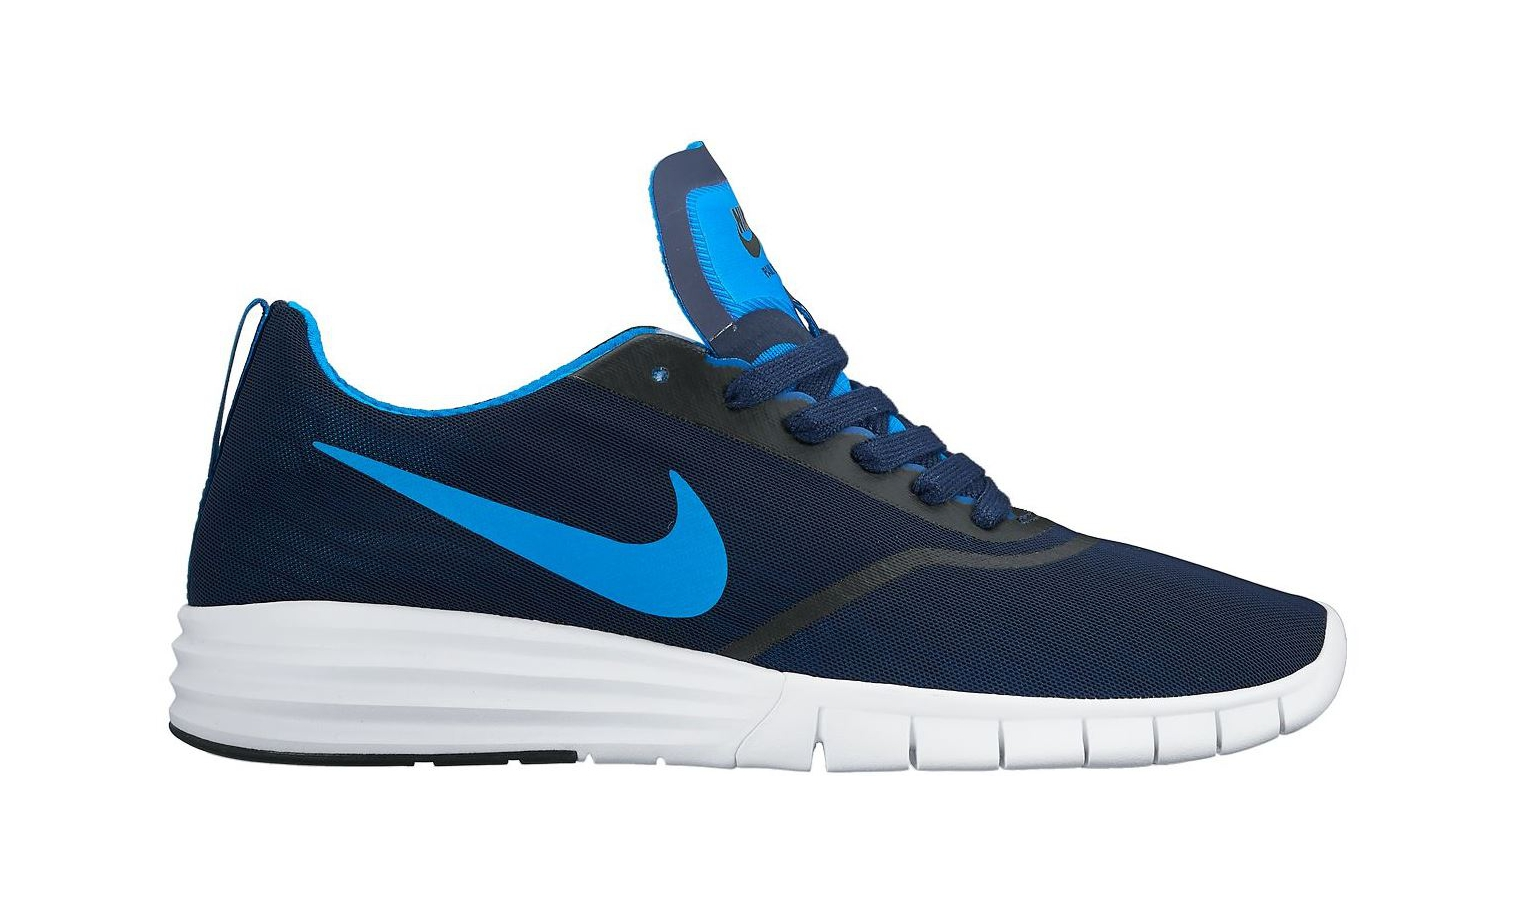 7babde35d2a Pánské boty Nike SB LUNAR PAUL RODRIGUEZ 9 R R modré